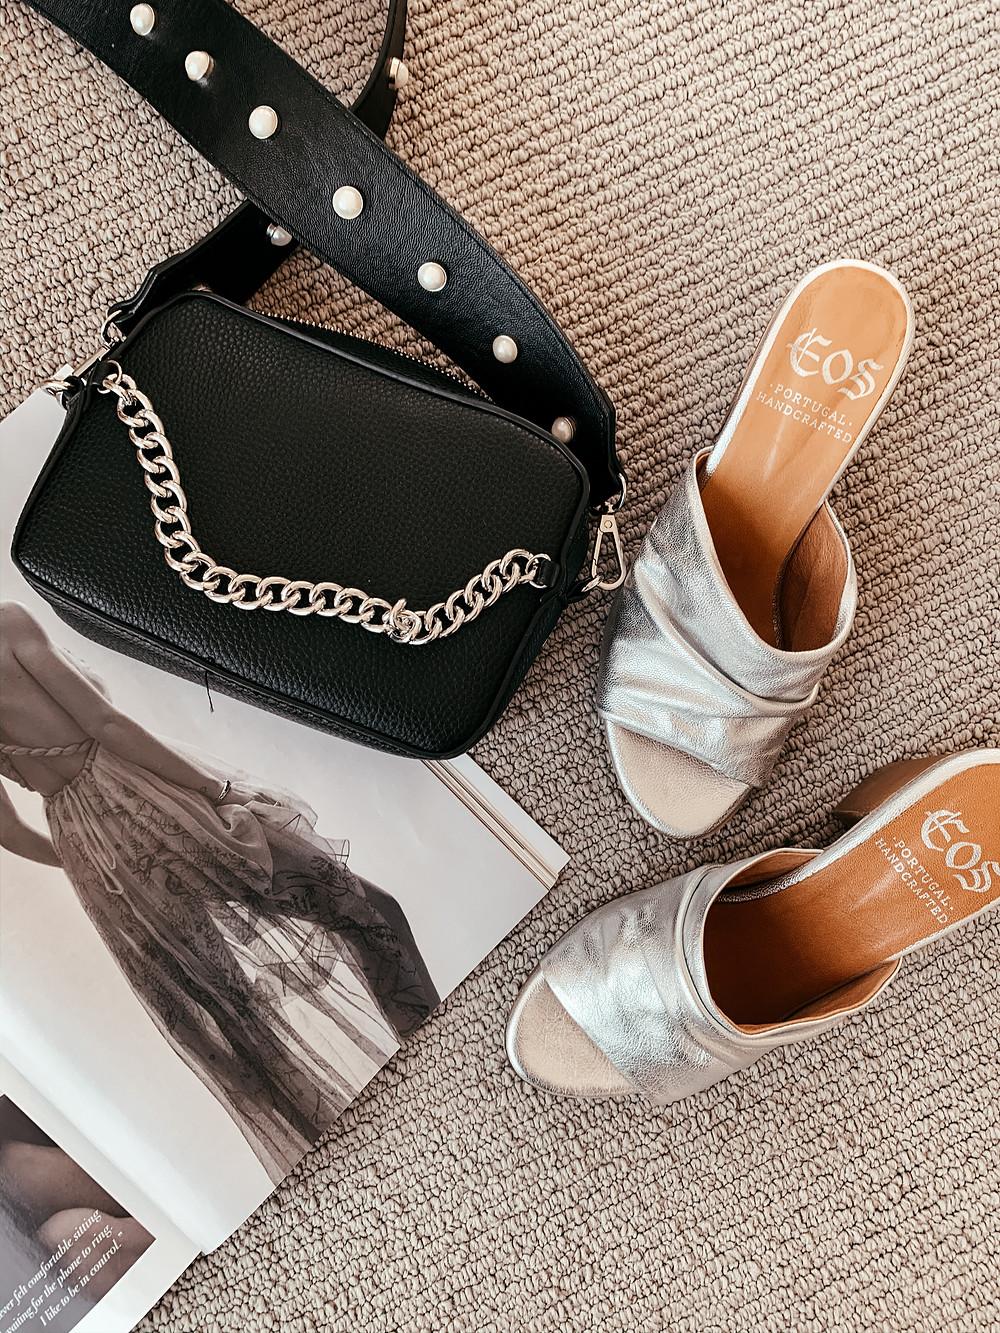 Silver EOS Footwear Mules